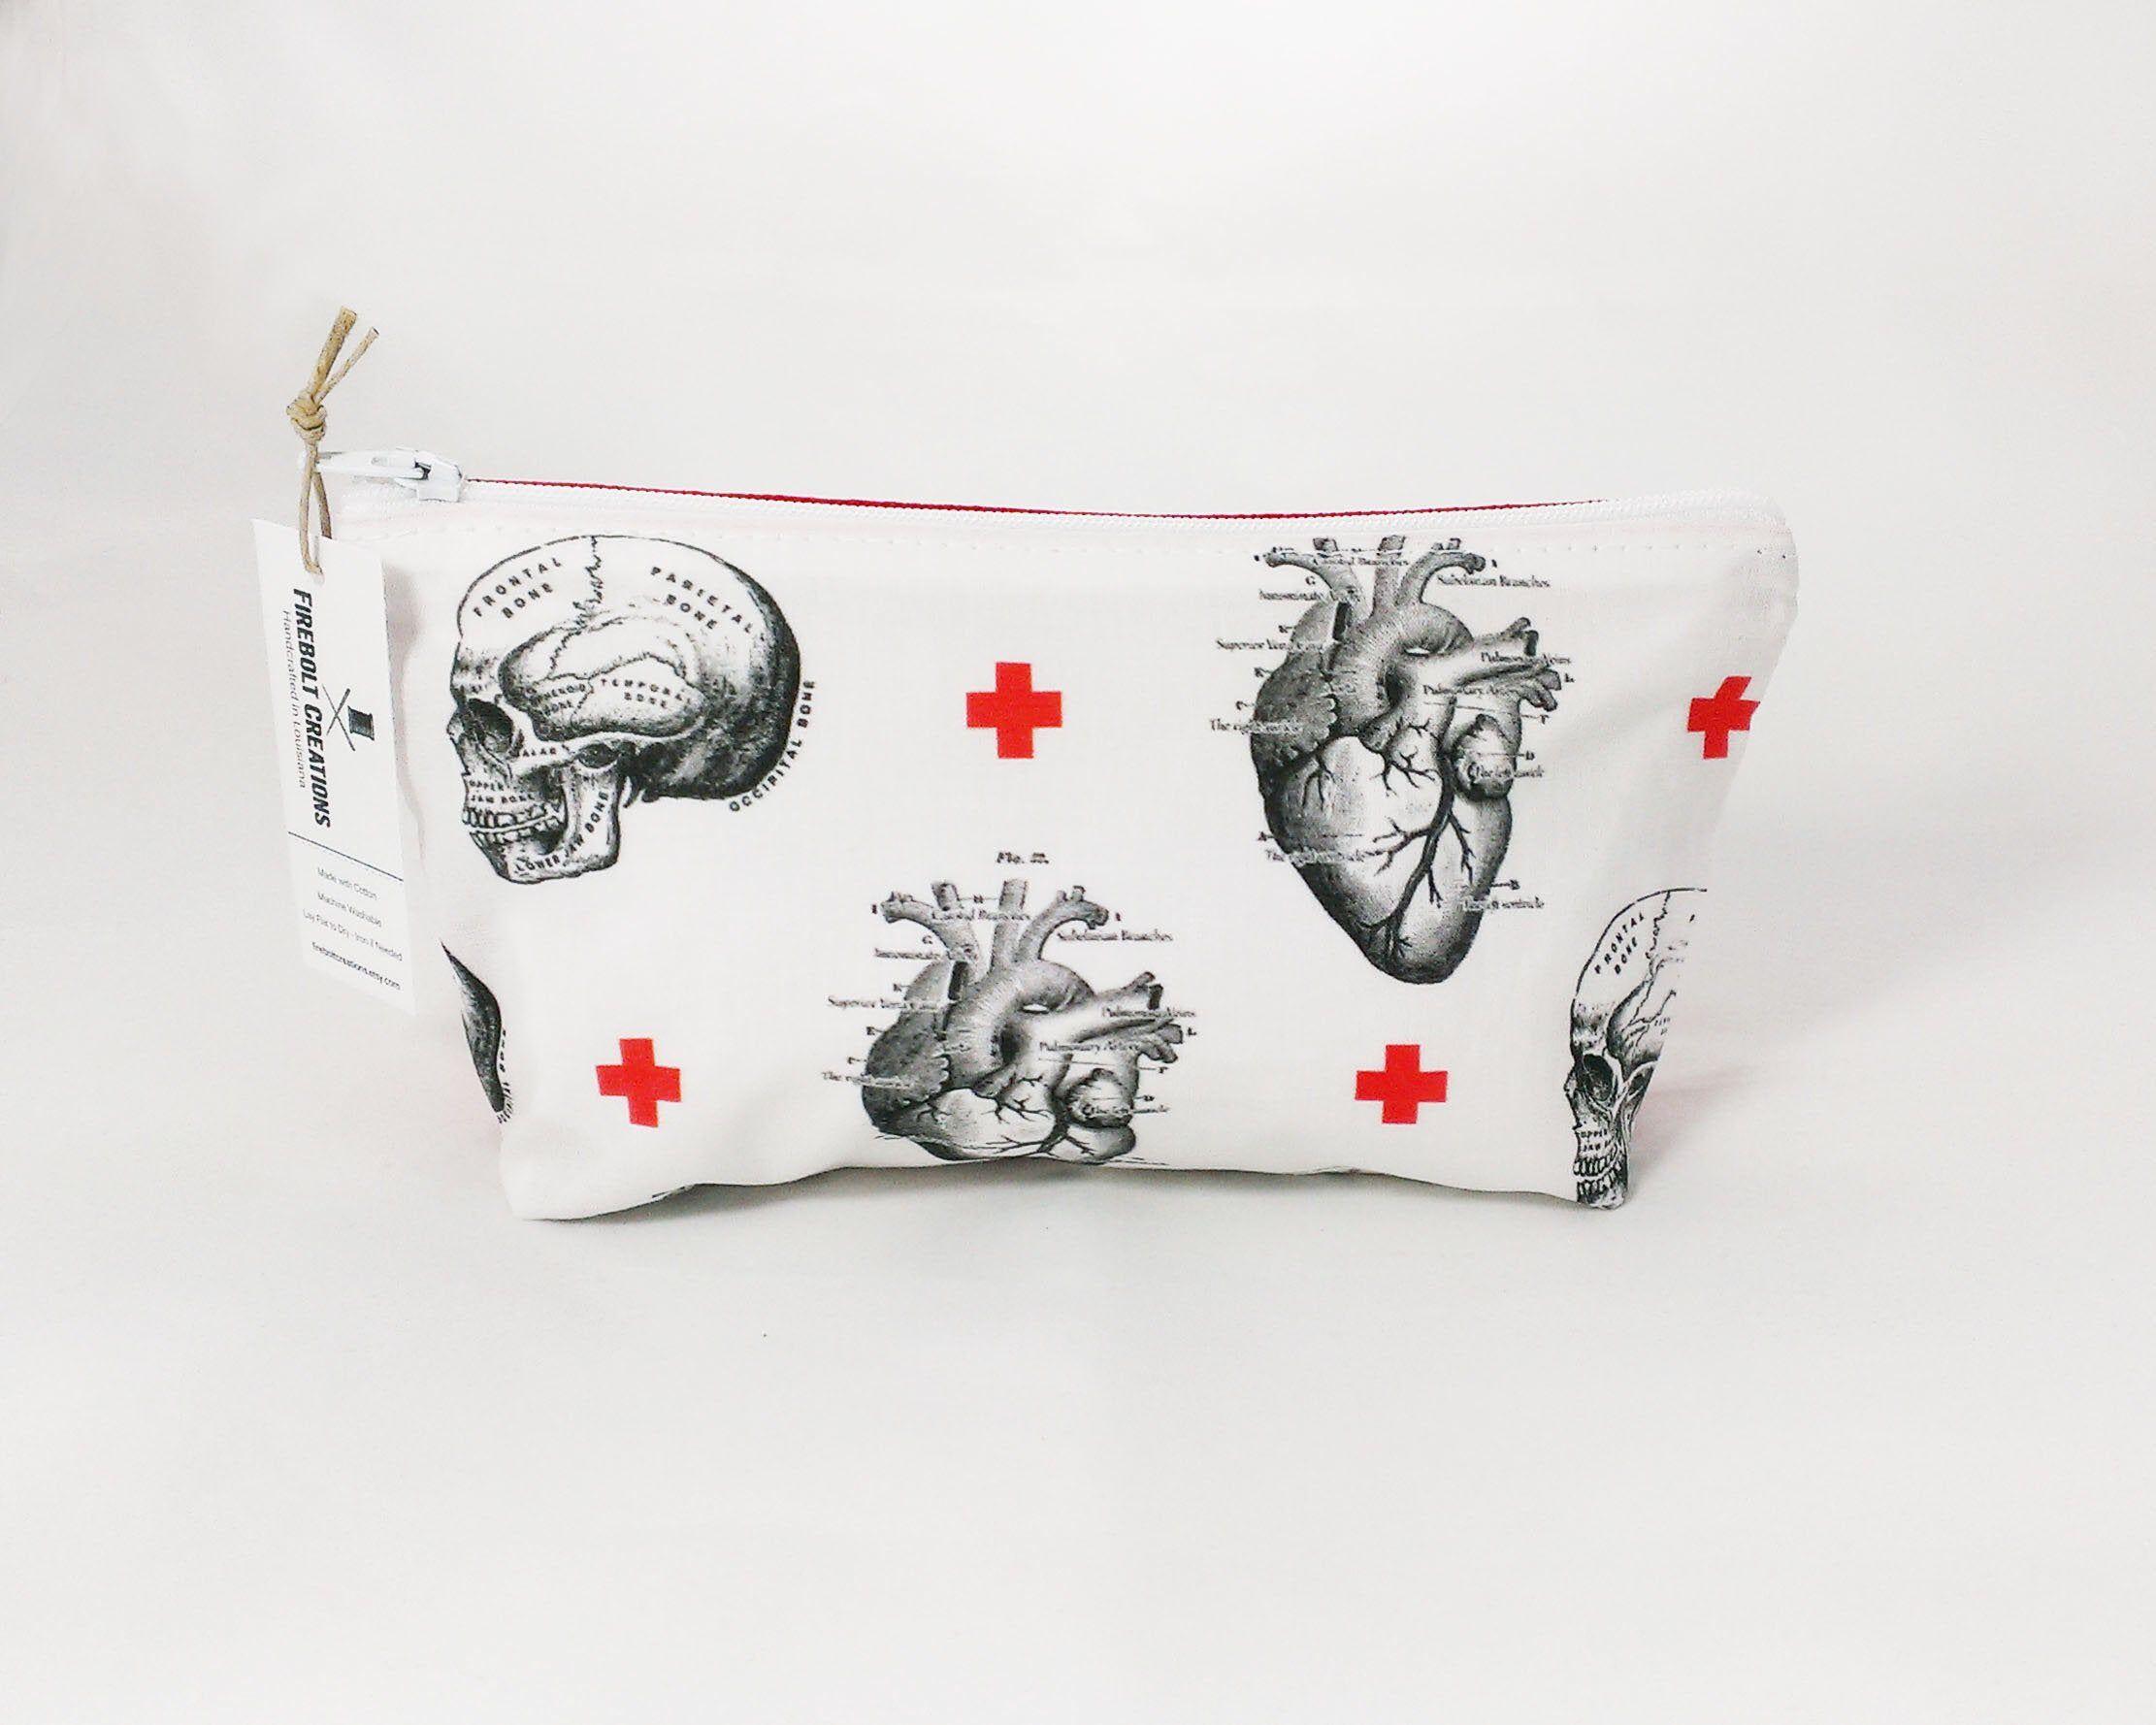 Medicine Bag medical student gift Anatomical Heart toiletry bag women nursing student nurse gift doctor gift halloween 061d784abb758102d0c1aef3d700bf03